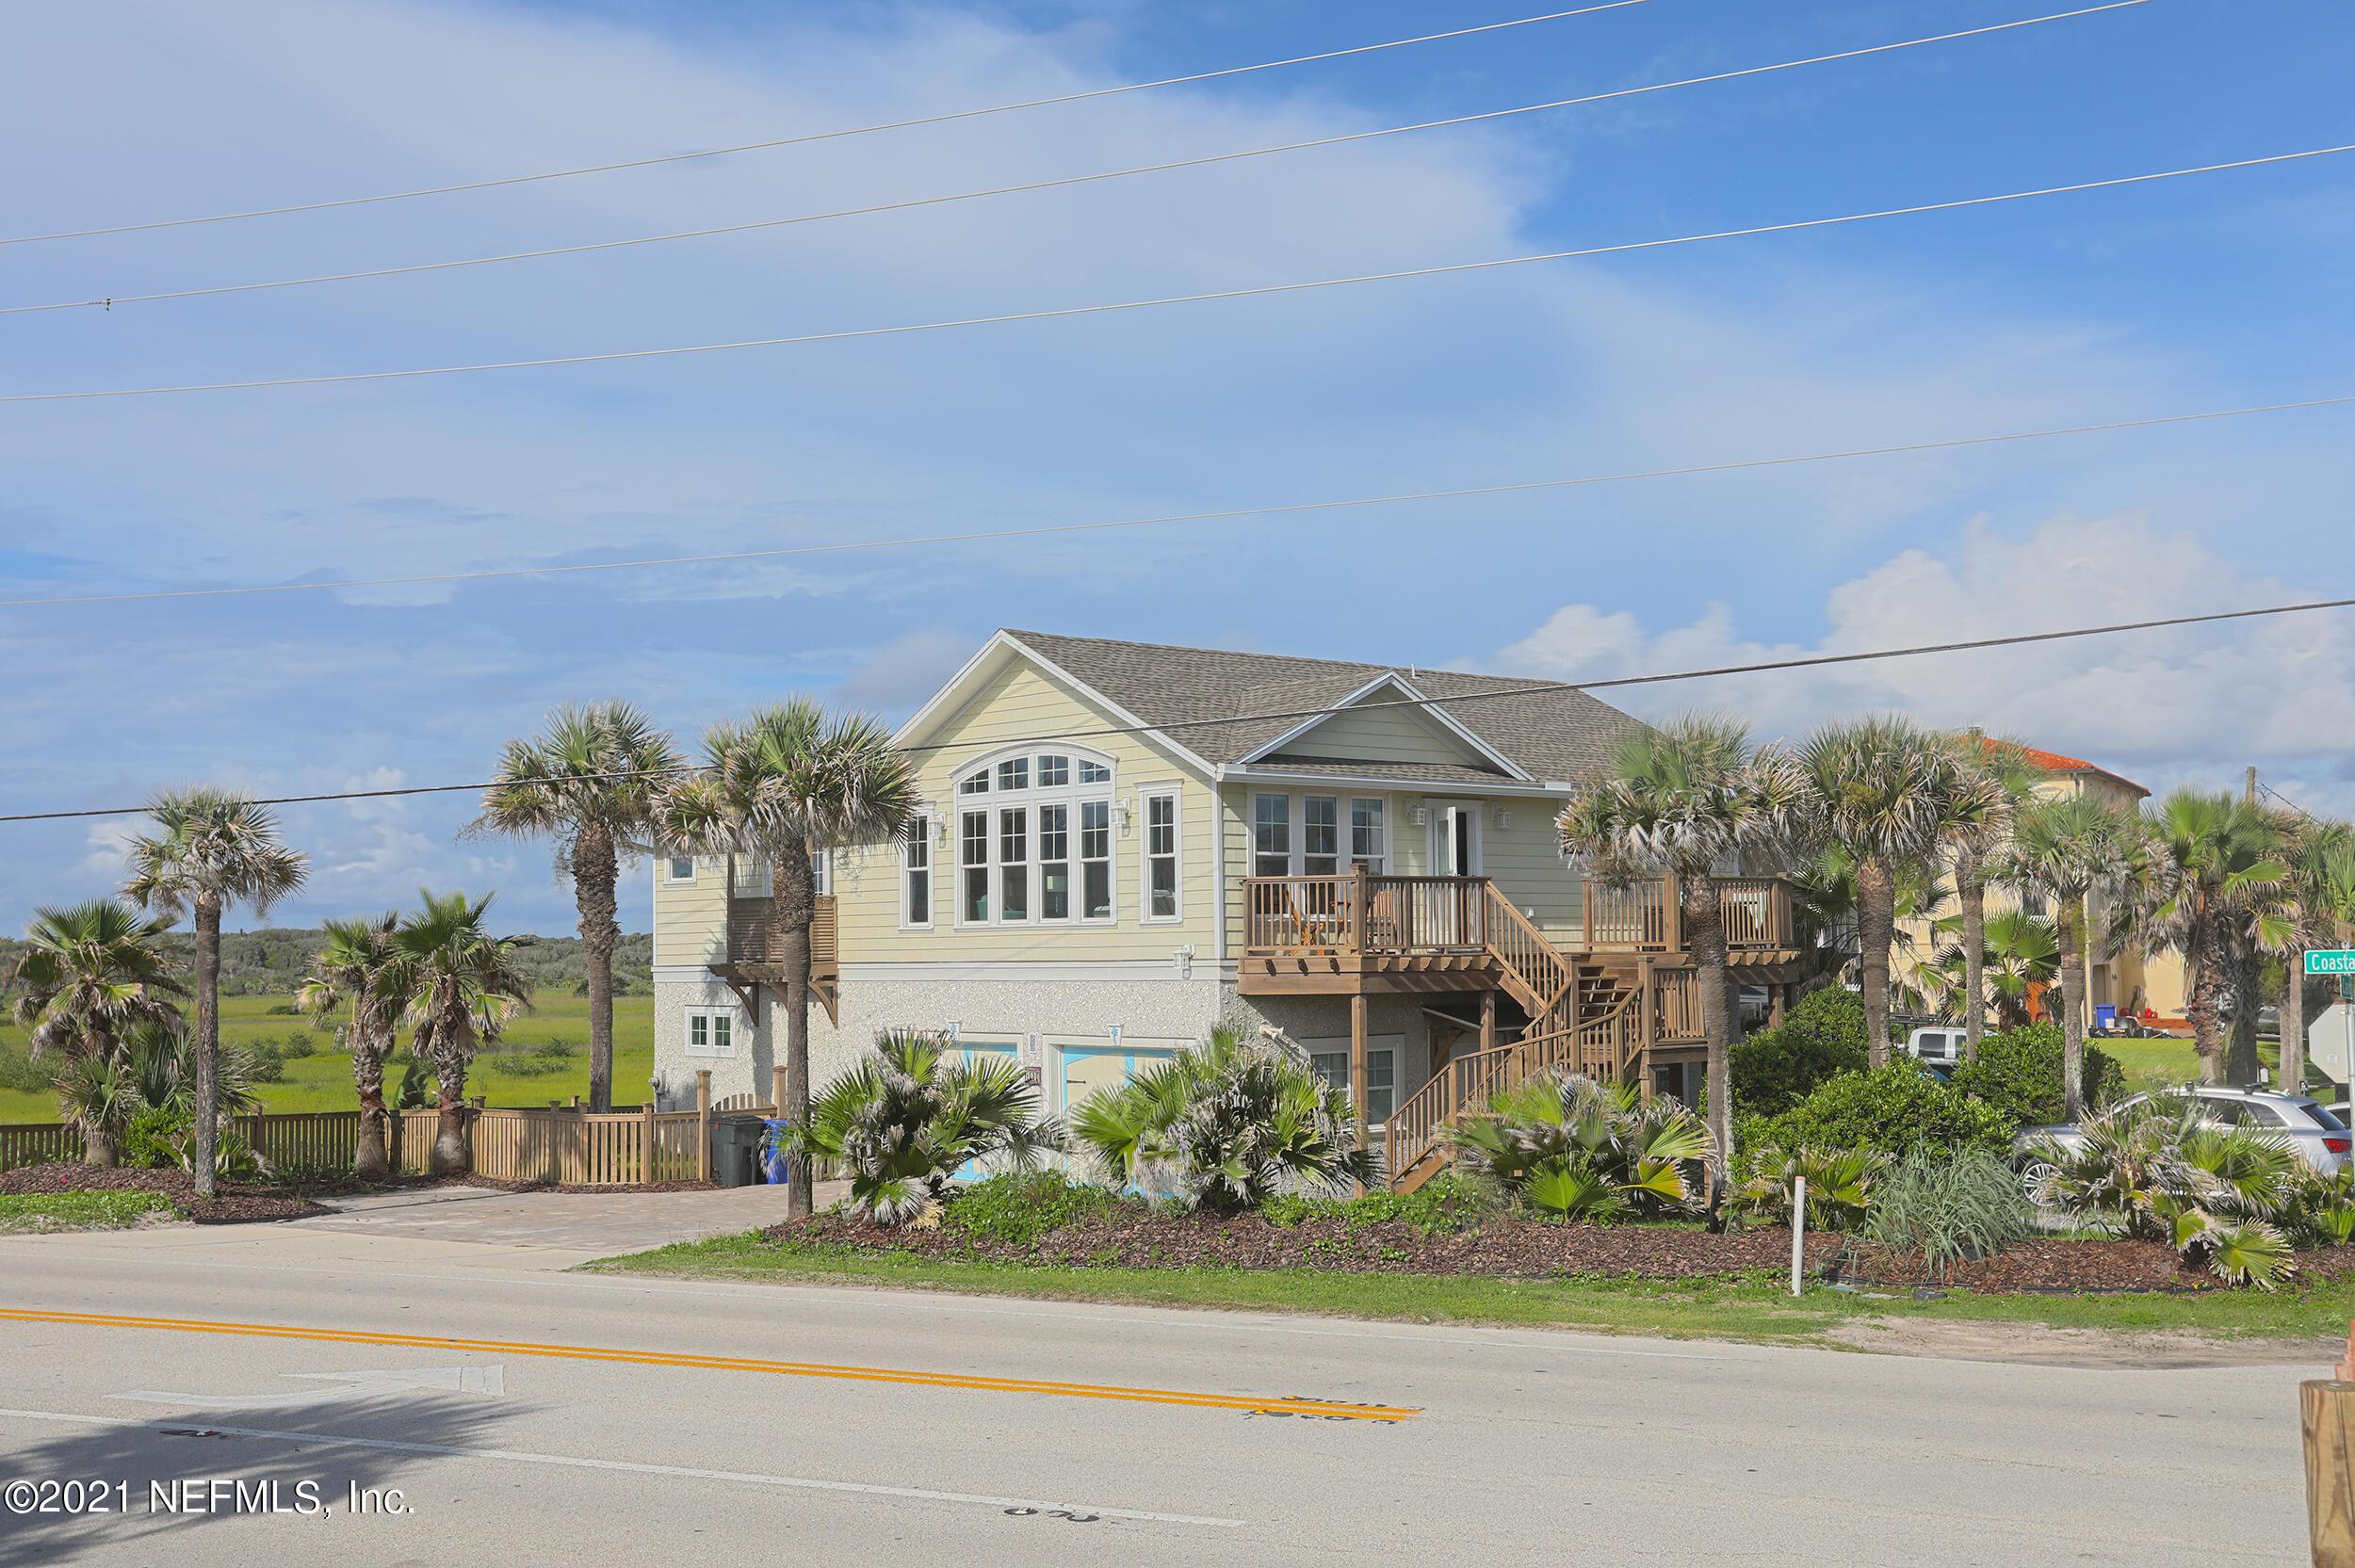 101 CARCABA, ST AUGUSTINE BEACH, FLORIDA 32084, 4 Bedrooms Bedrooms, ,4 BathroomsBathrooms,Rental,For Rent,CARCABA,1130578